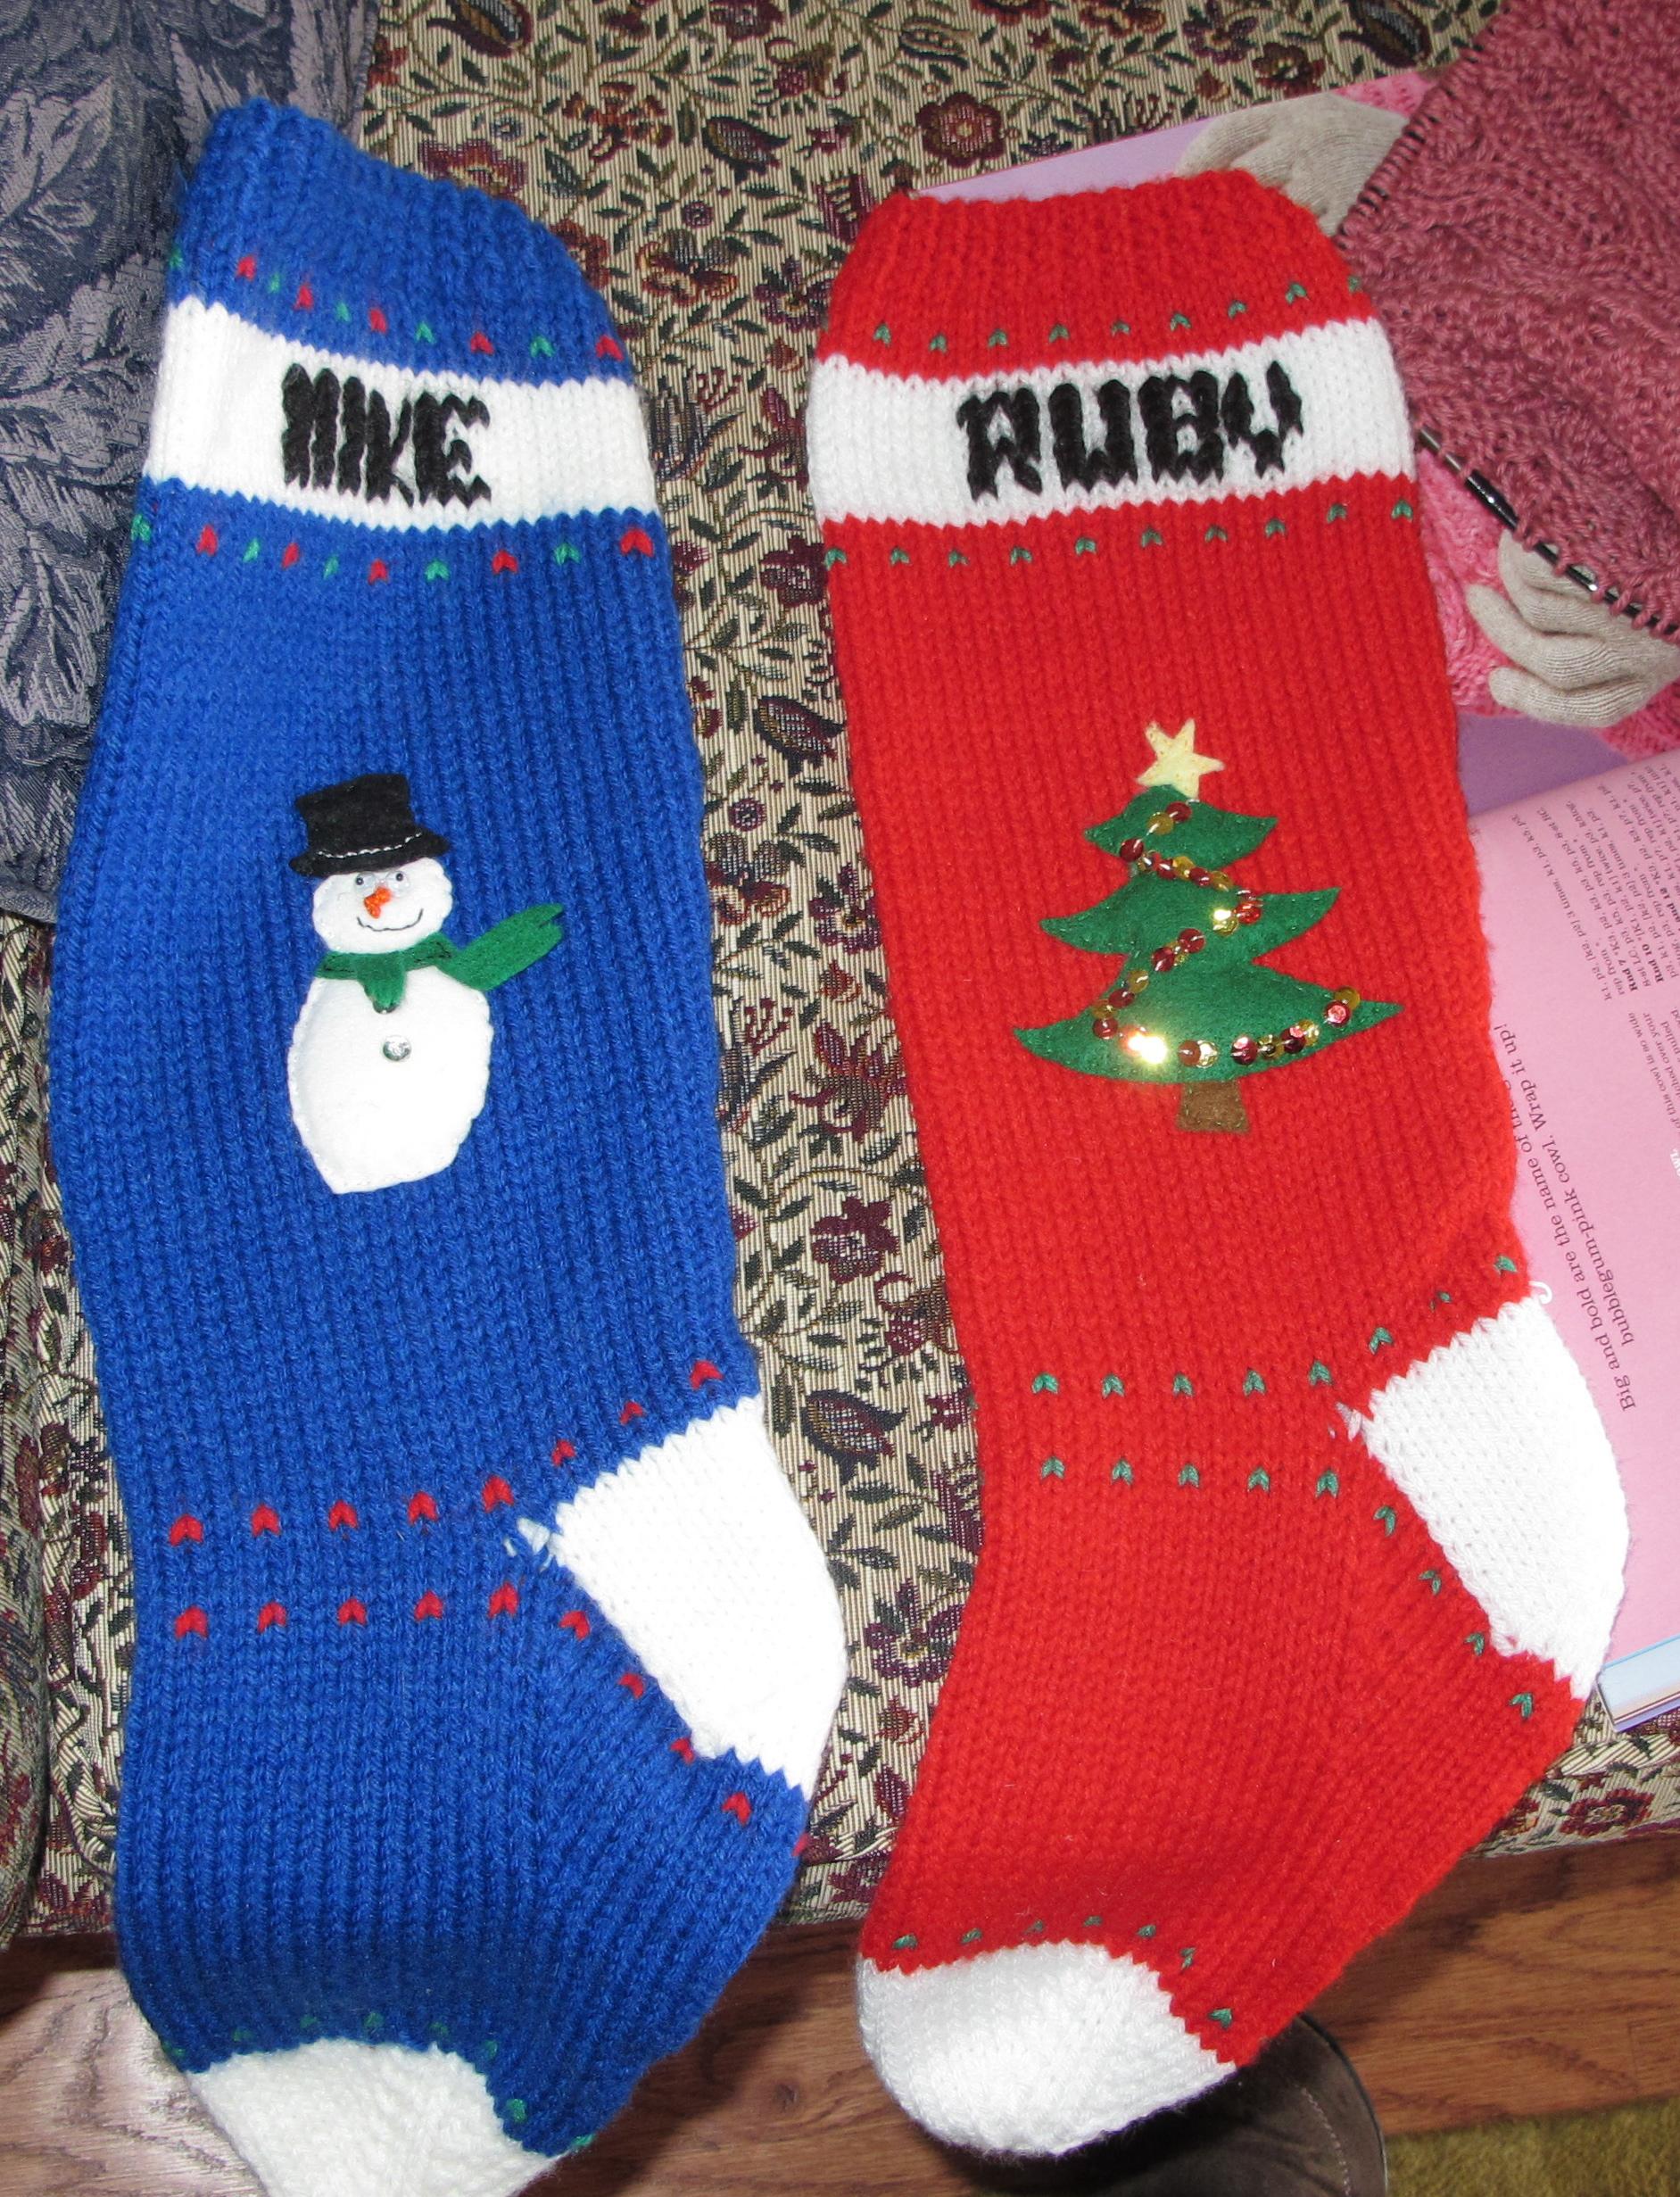 Knitting Christmas Stocking Pattern Free.The Christmas Stocking Assignment Wool Free And Lovin Knit